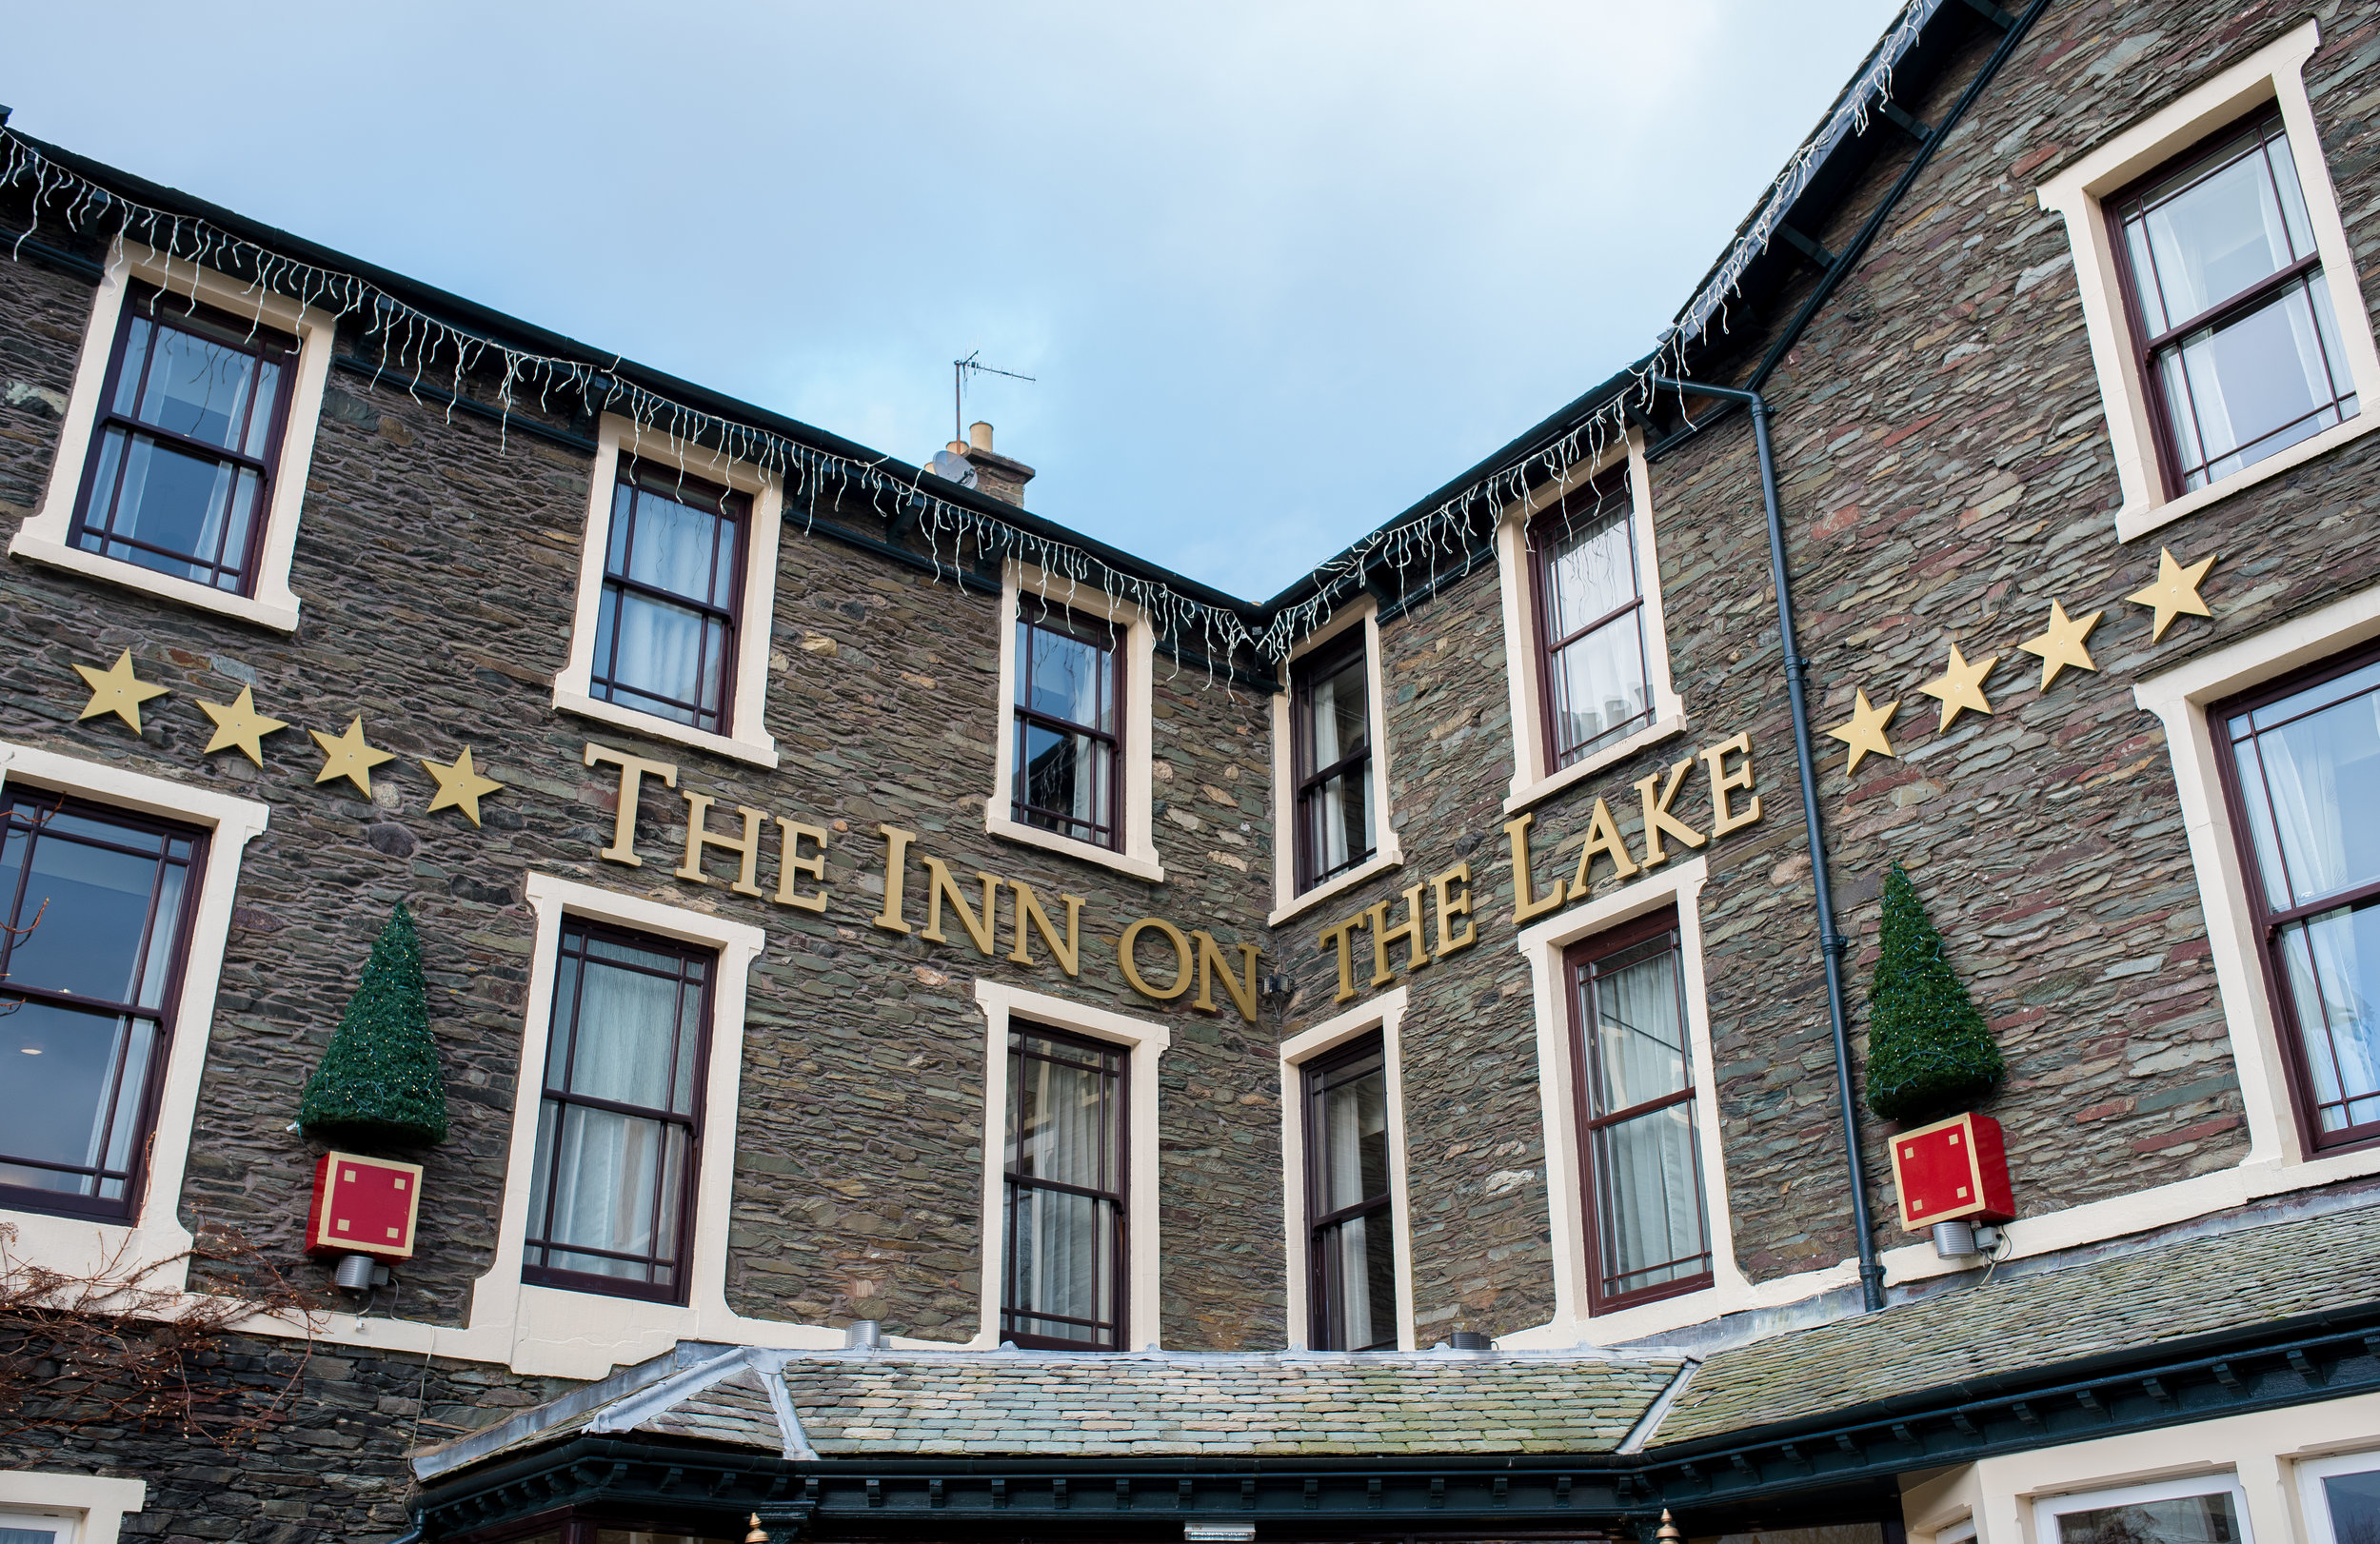 The Inn on The Lake Glenridding Christmas